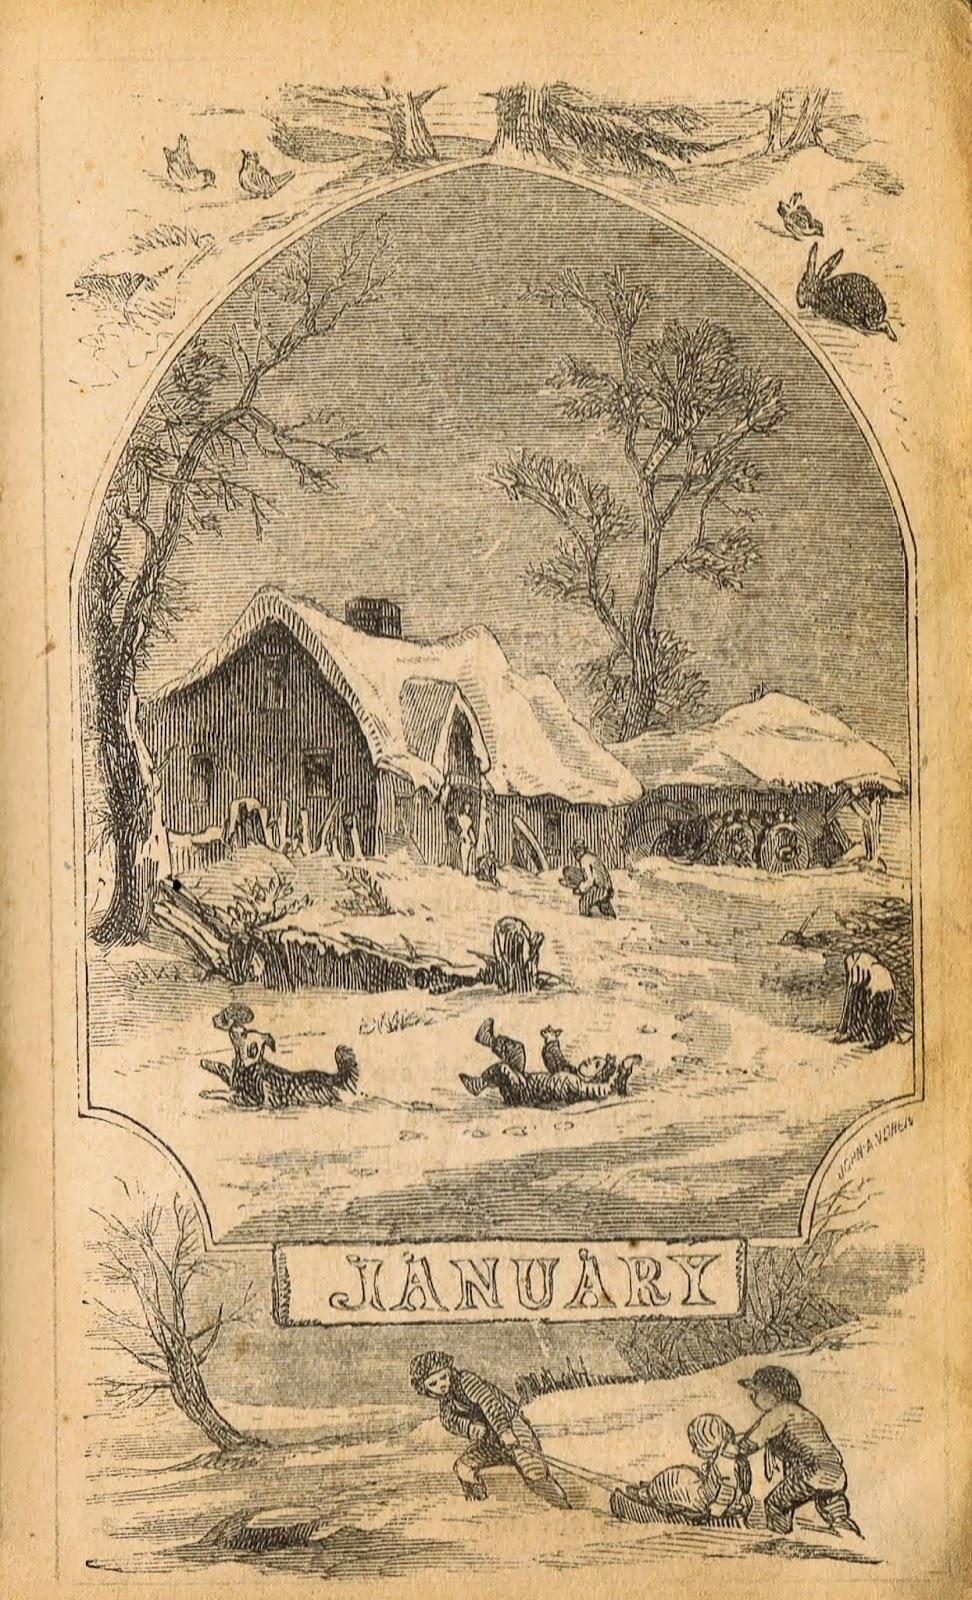 Antique Winter Sledding Illustrations - Antique Graphics ...